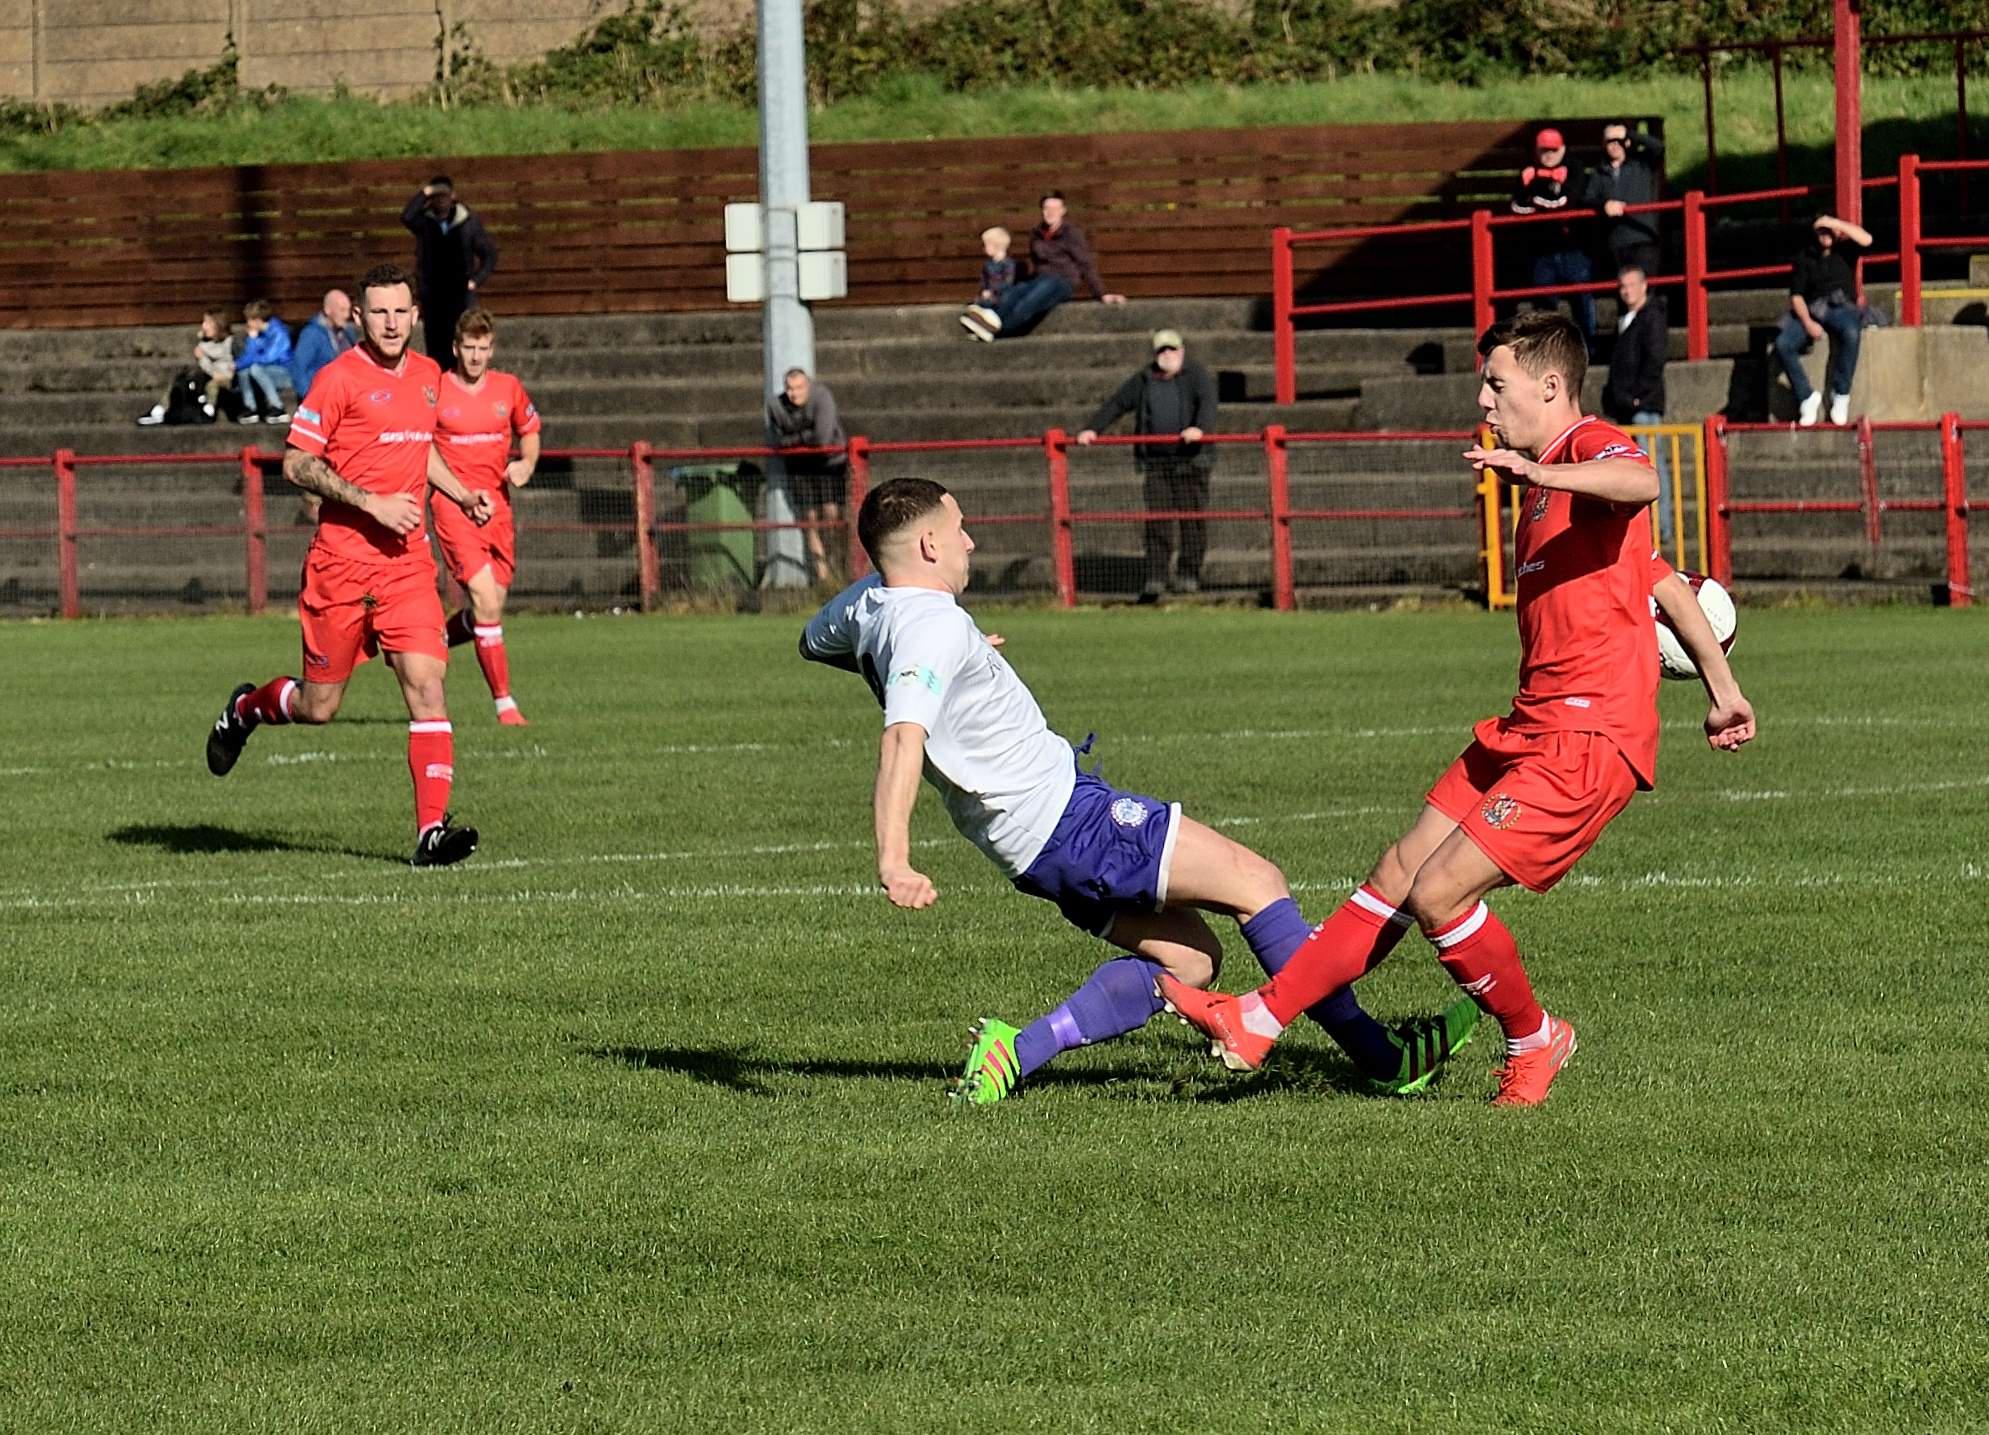 Workington 5 Rams 1 - Match Action